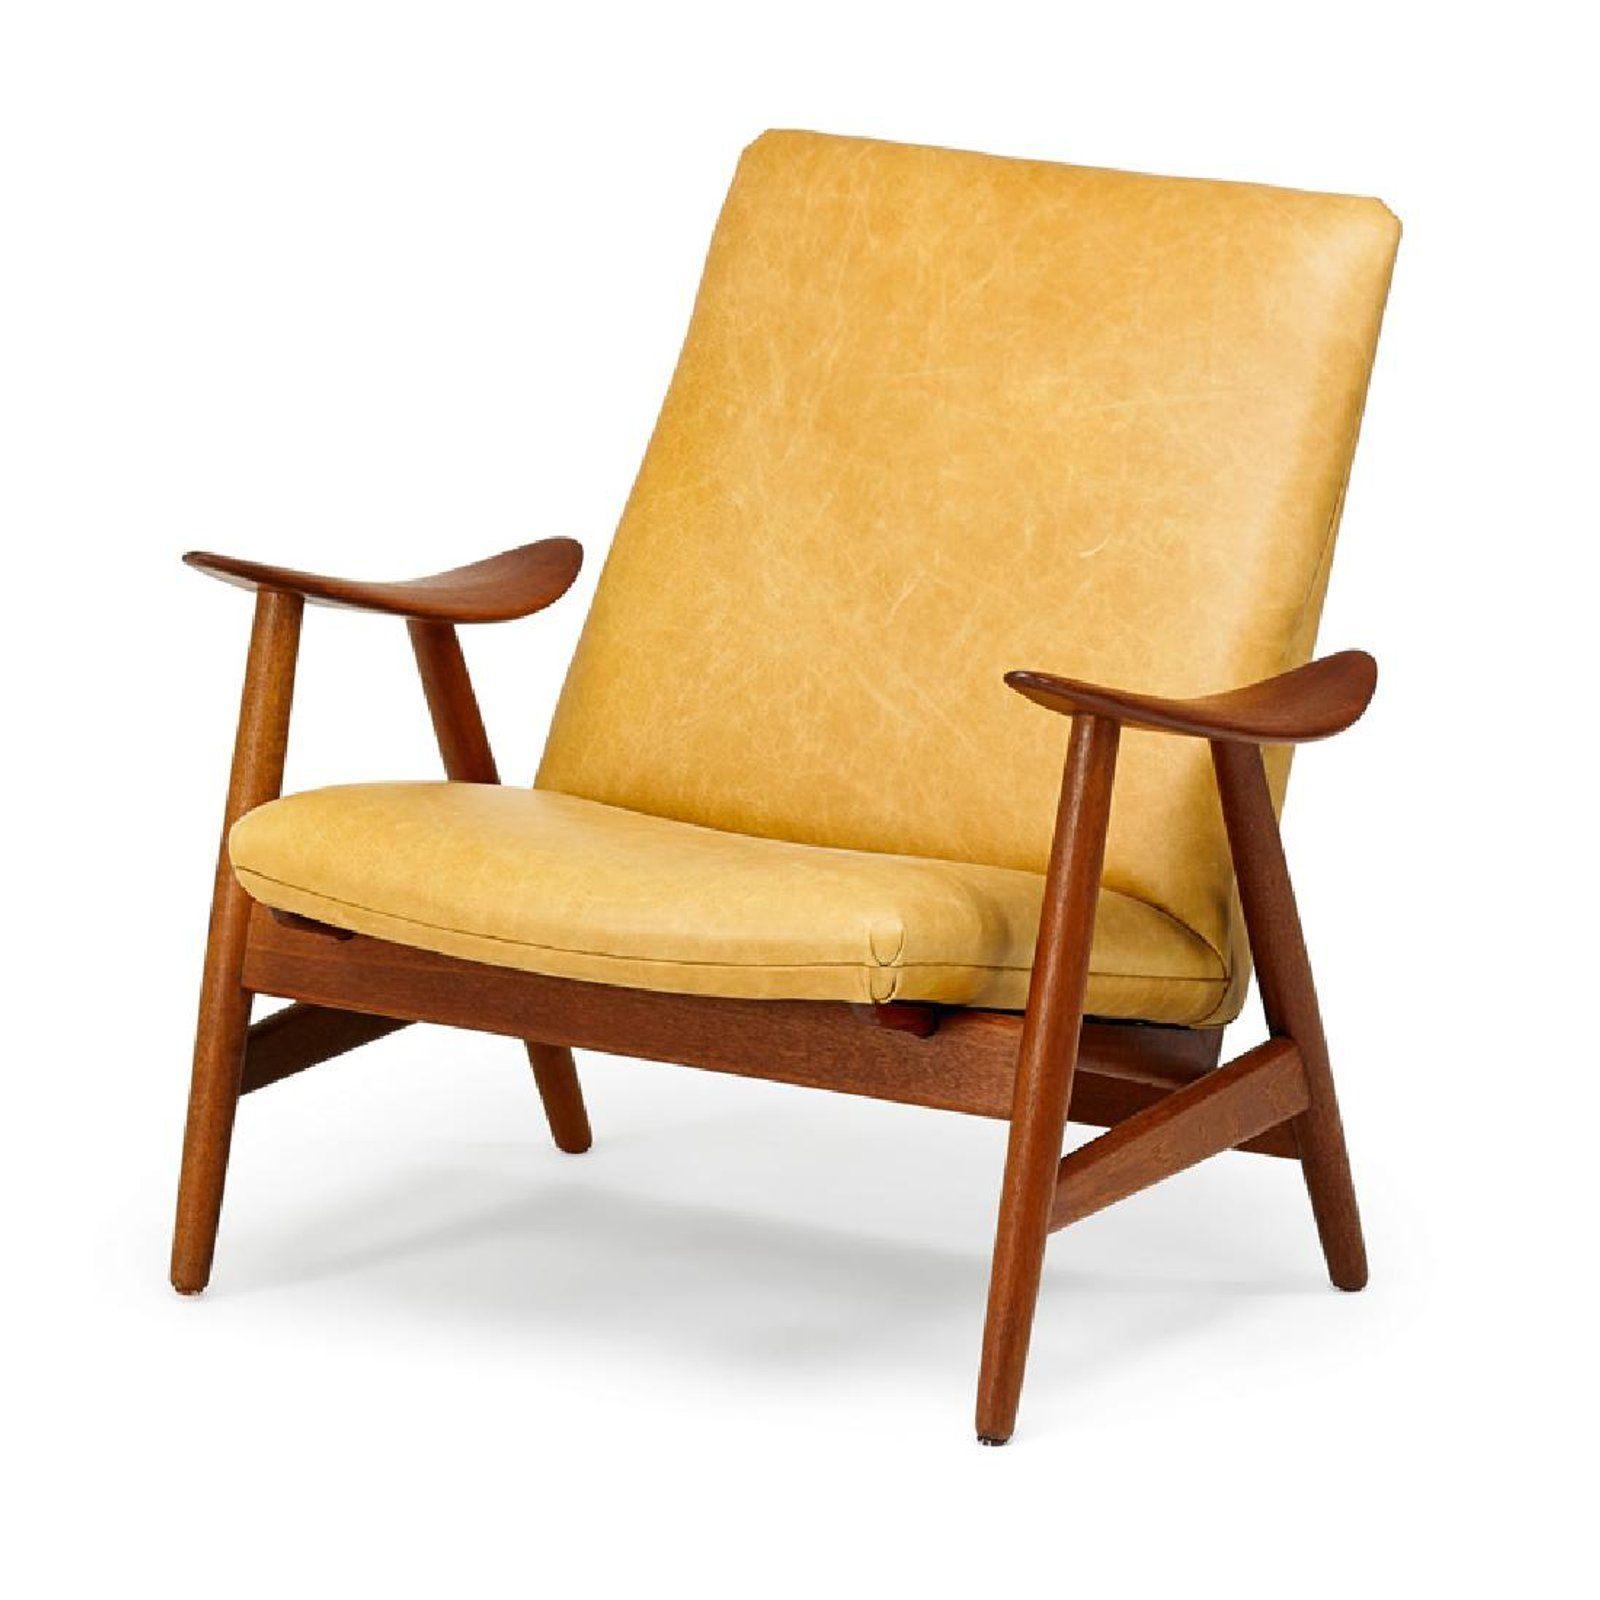 Illum wikkelso for soren willadsen lounge chair interiors